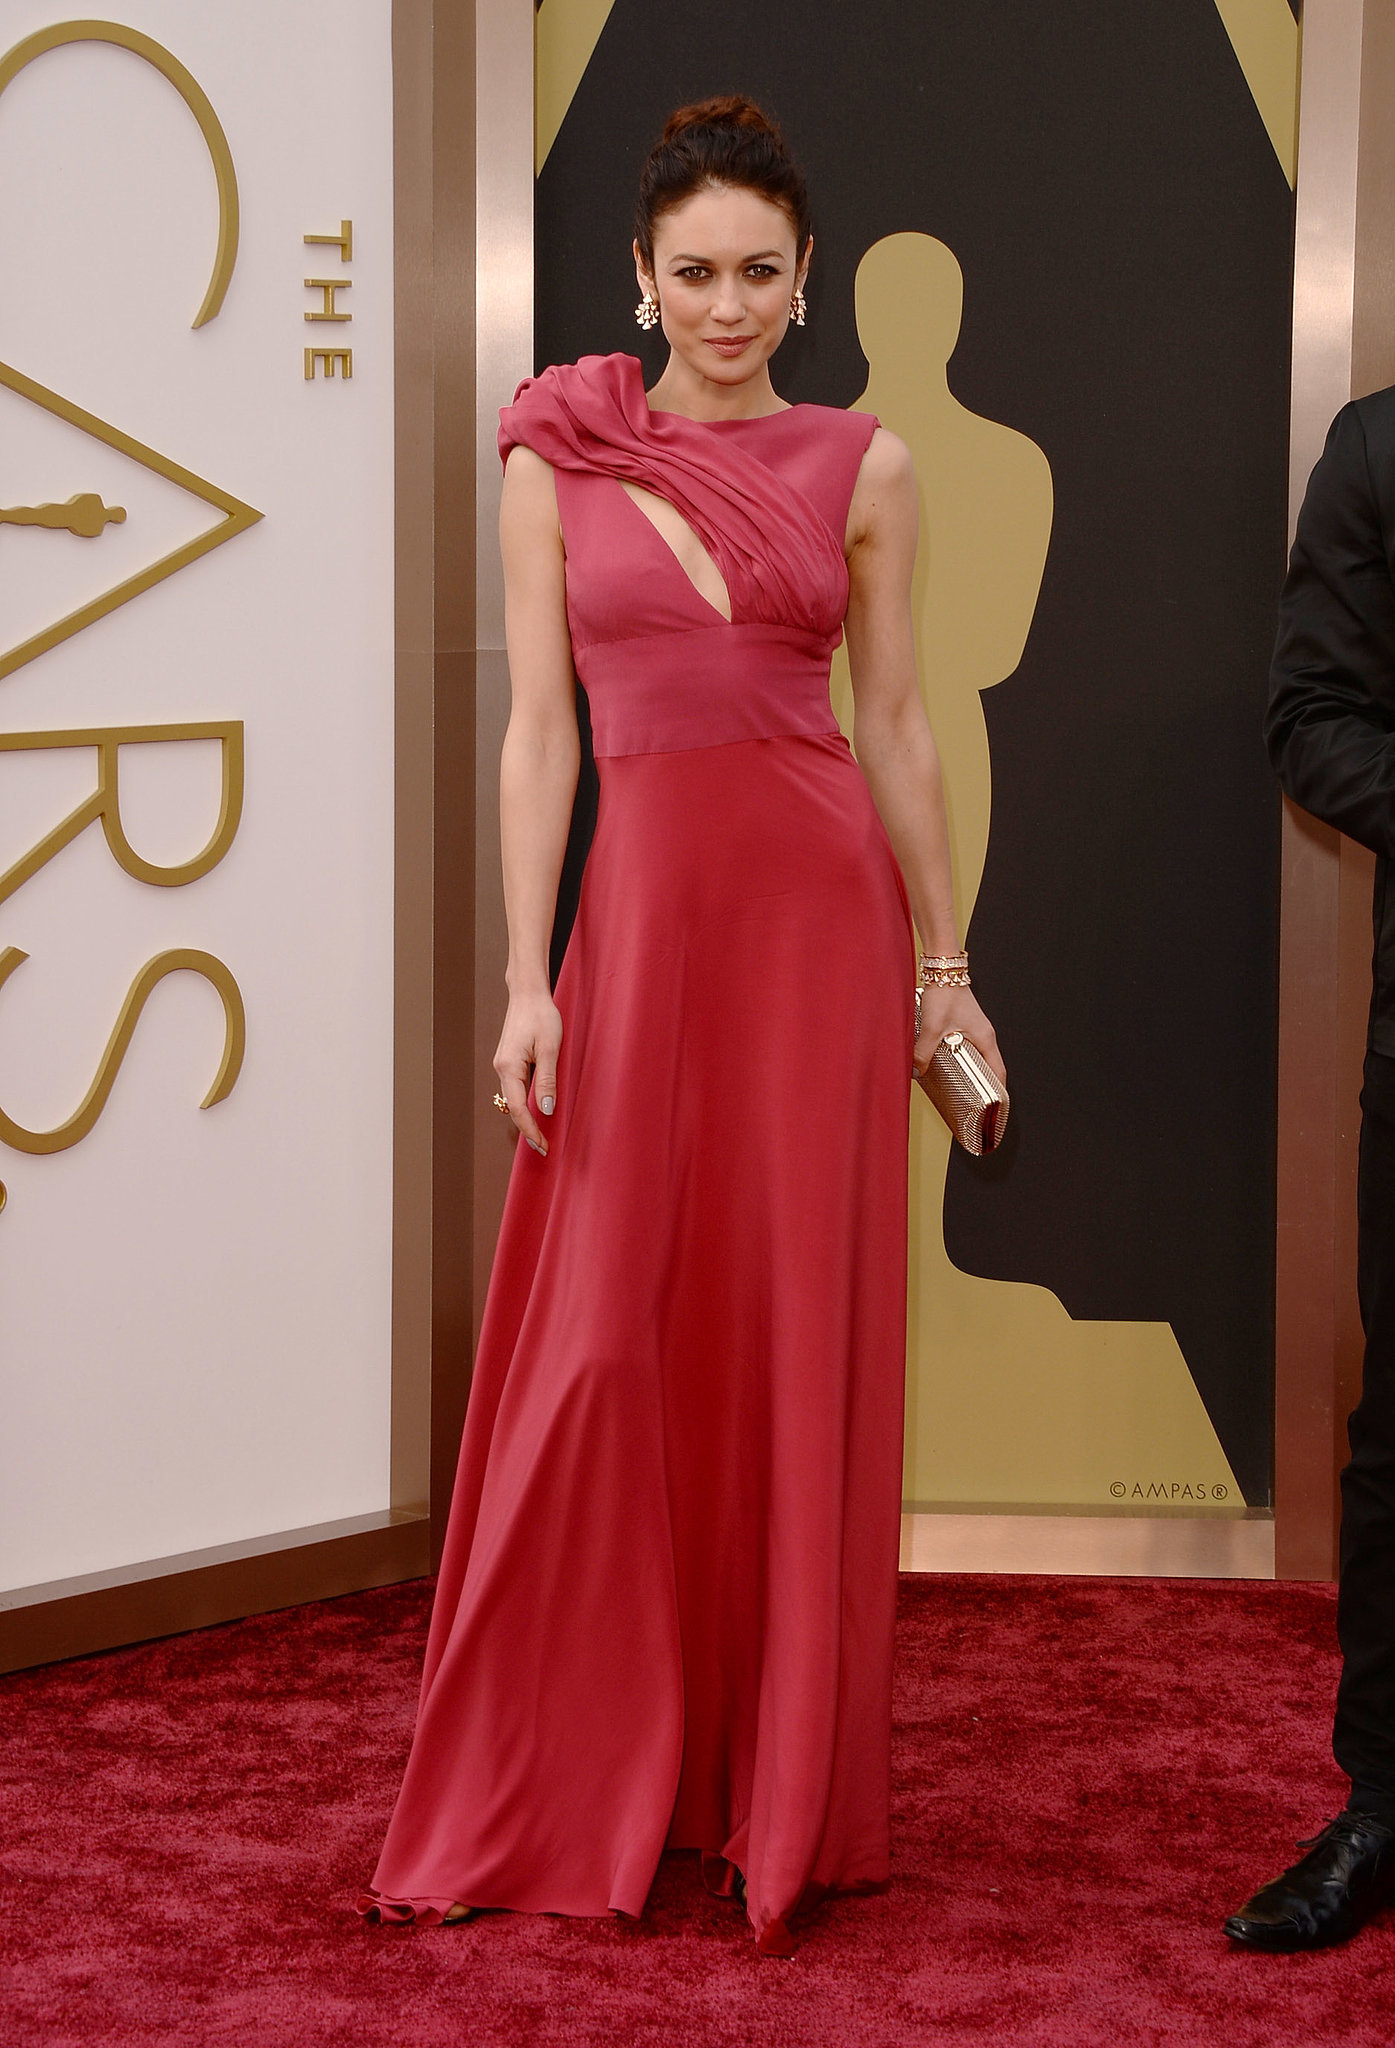 http://media1.onsugar.com/files/2014/03/02/043/n/1922564/8a4c1486fb4b75cd_476193315.jpg.xxxlarge_2x/i/Olga-Kurylenko-2014-Oscars.jpg